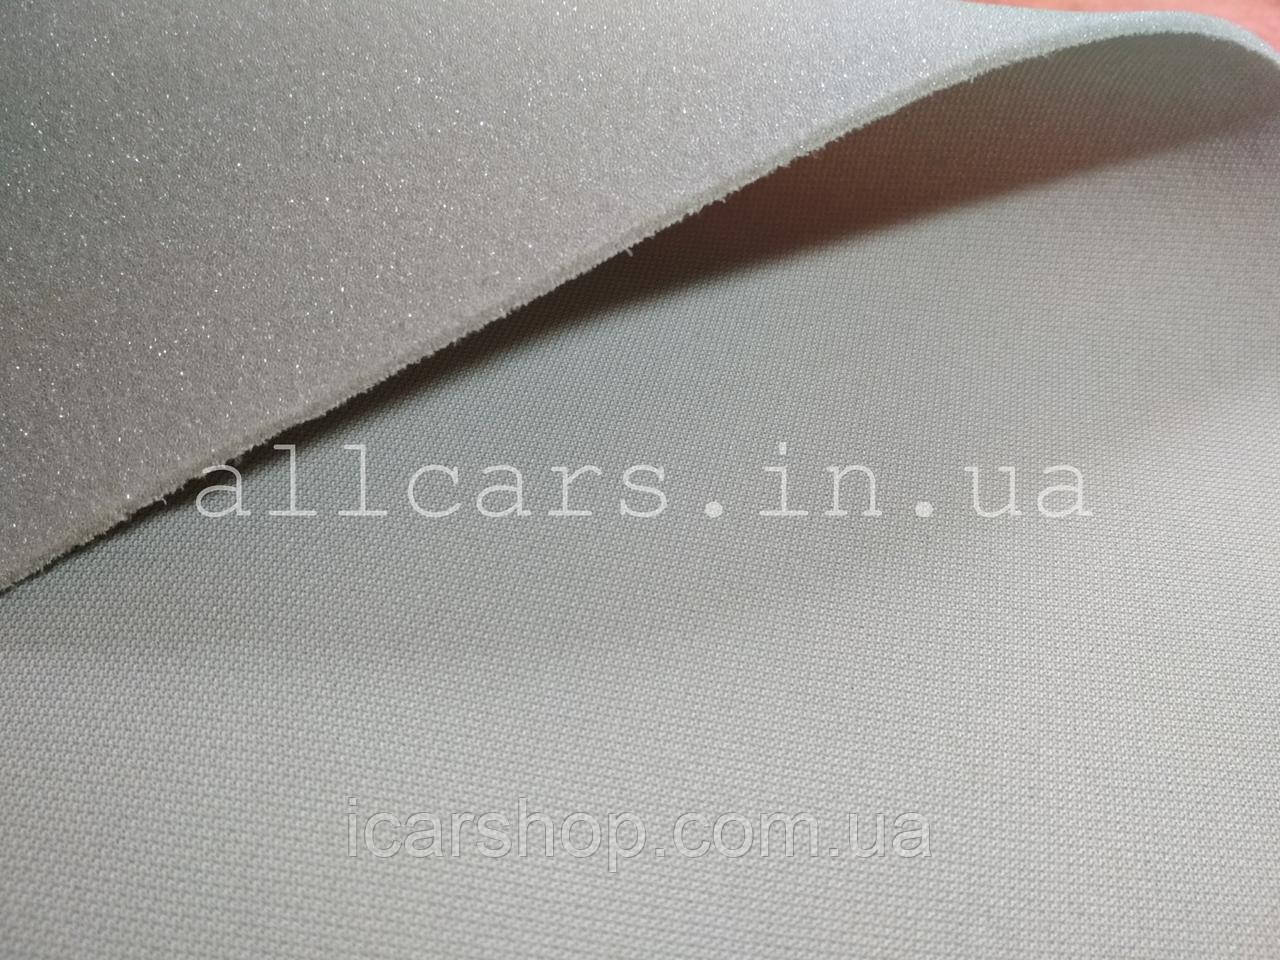 Потолочная ткань Volkswagen-T5 ORG (ширина 1.36 м)